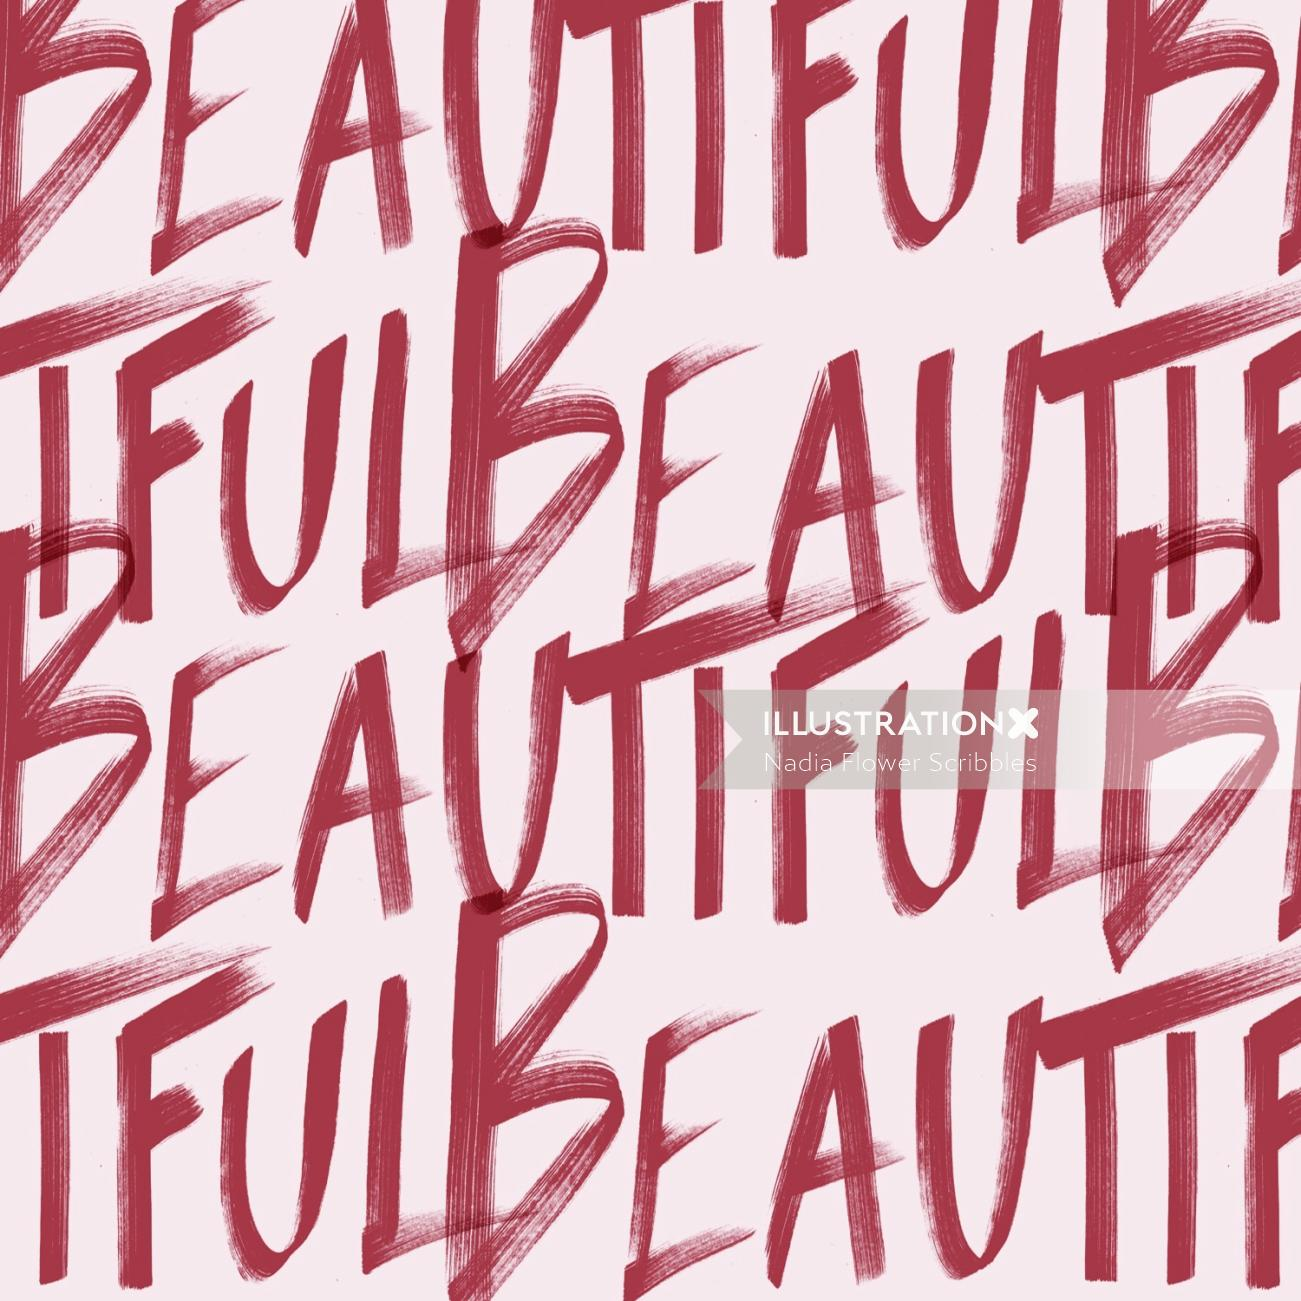 Lettering Beautiful